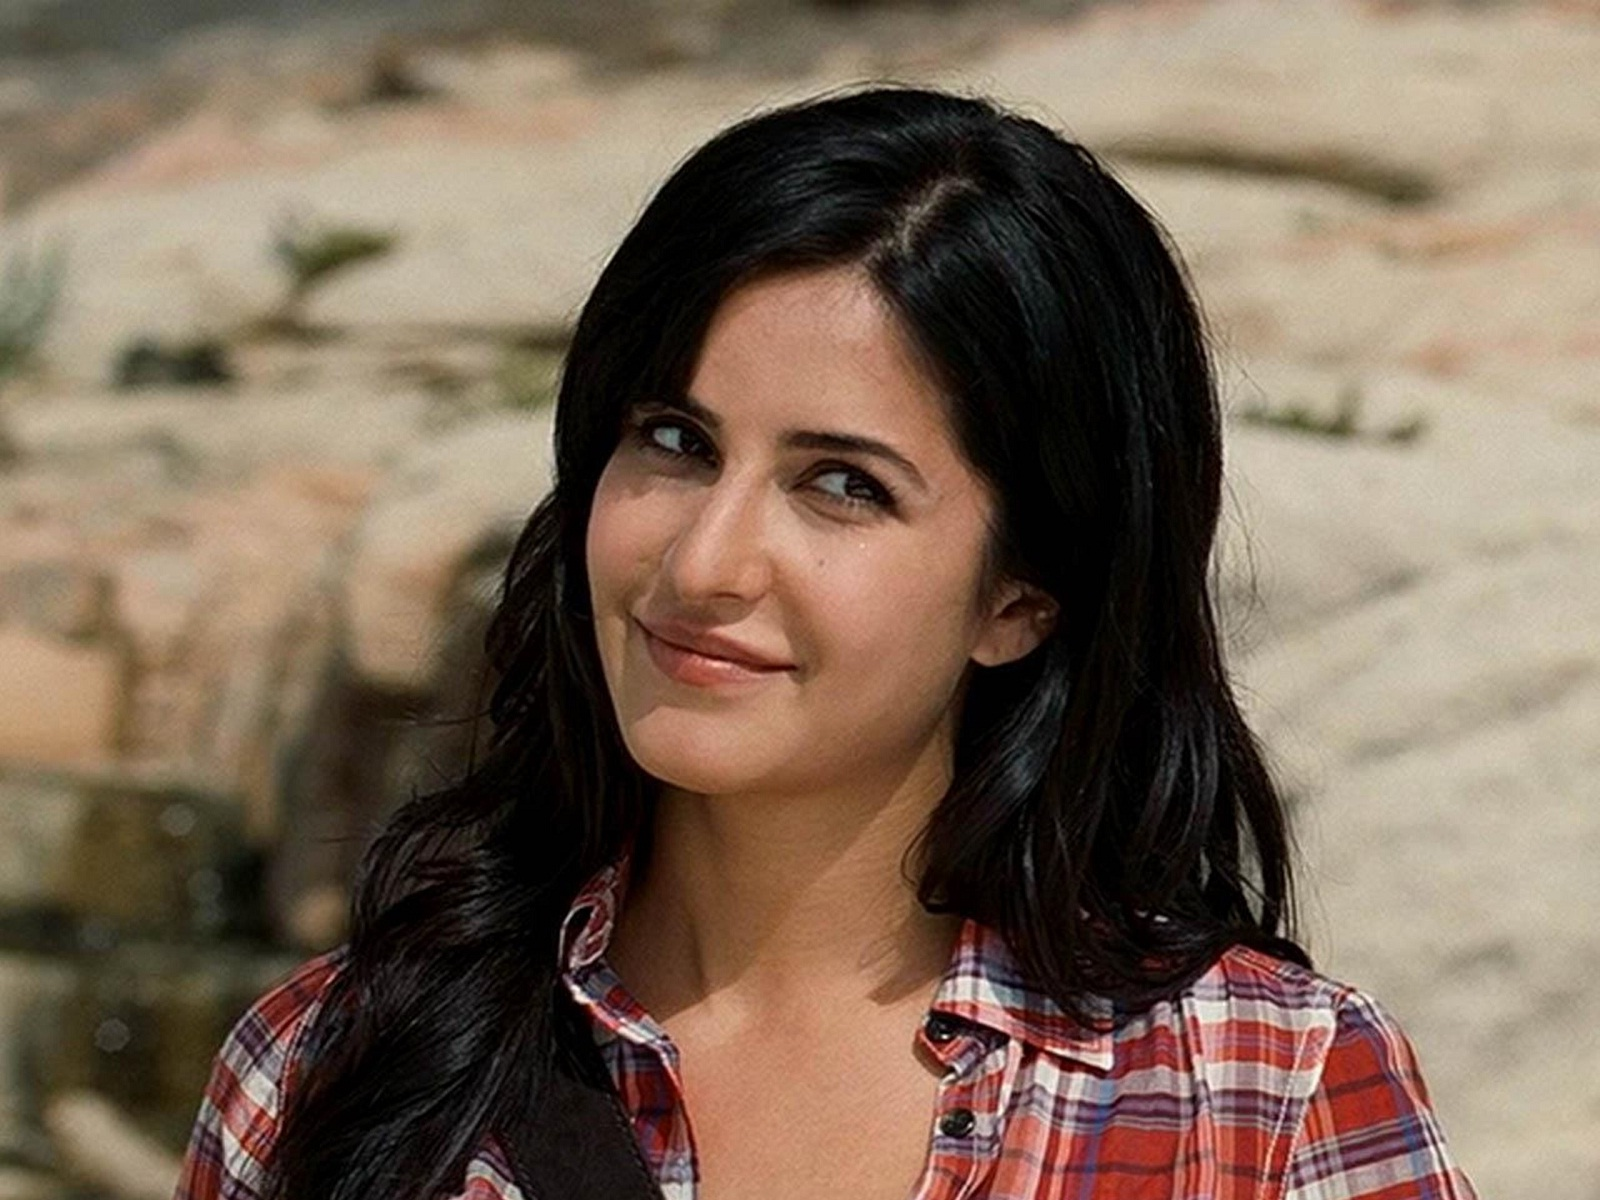 Katrina Kaif cute smile in shirt HD Wallpapers Rocks 1600x1200